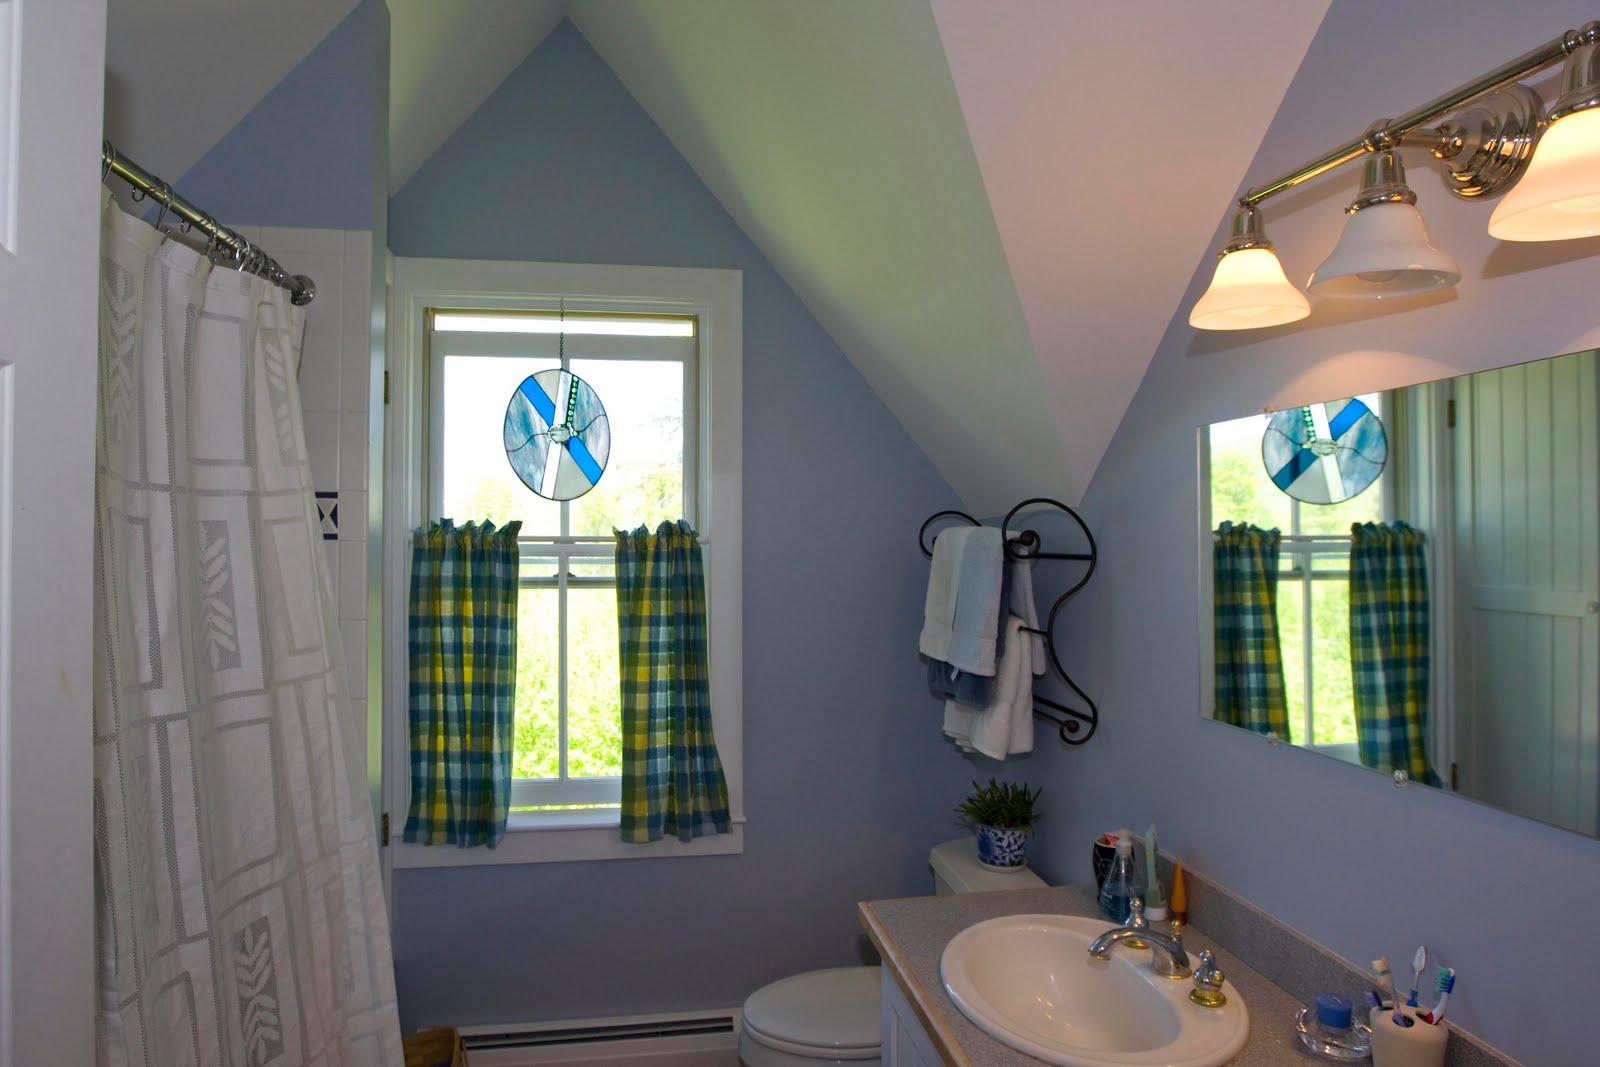 Bathroom ceiling paint flat or semi gloss - Saturday October 30 2010